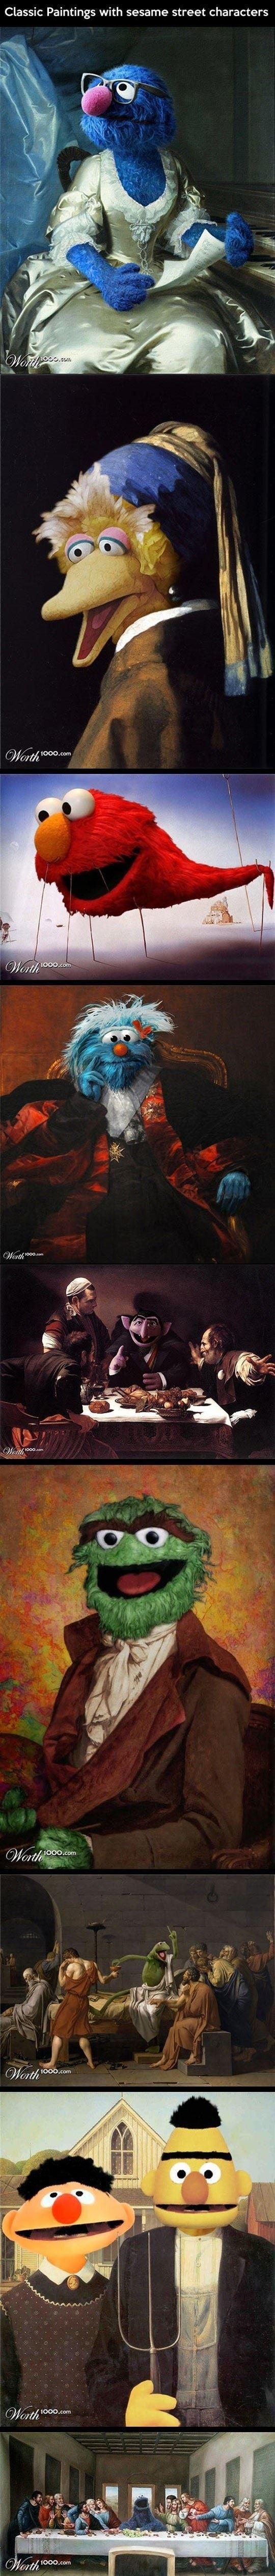 Sesame Street Classic Paintings